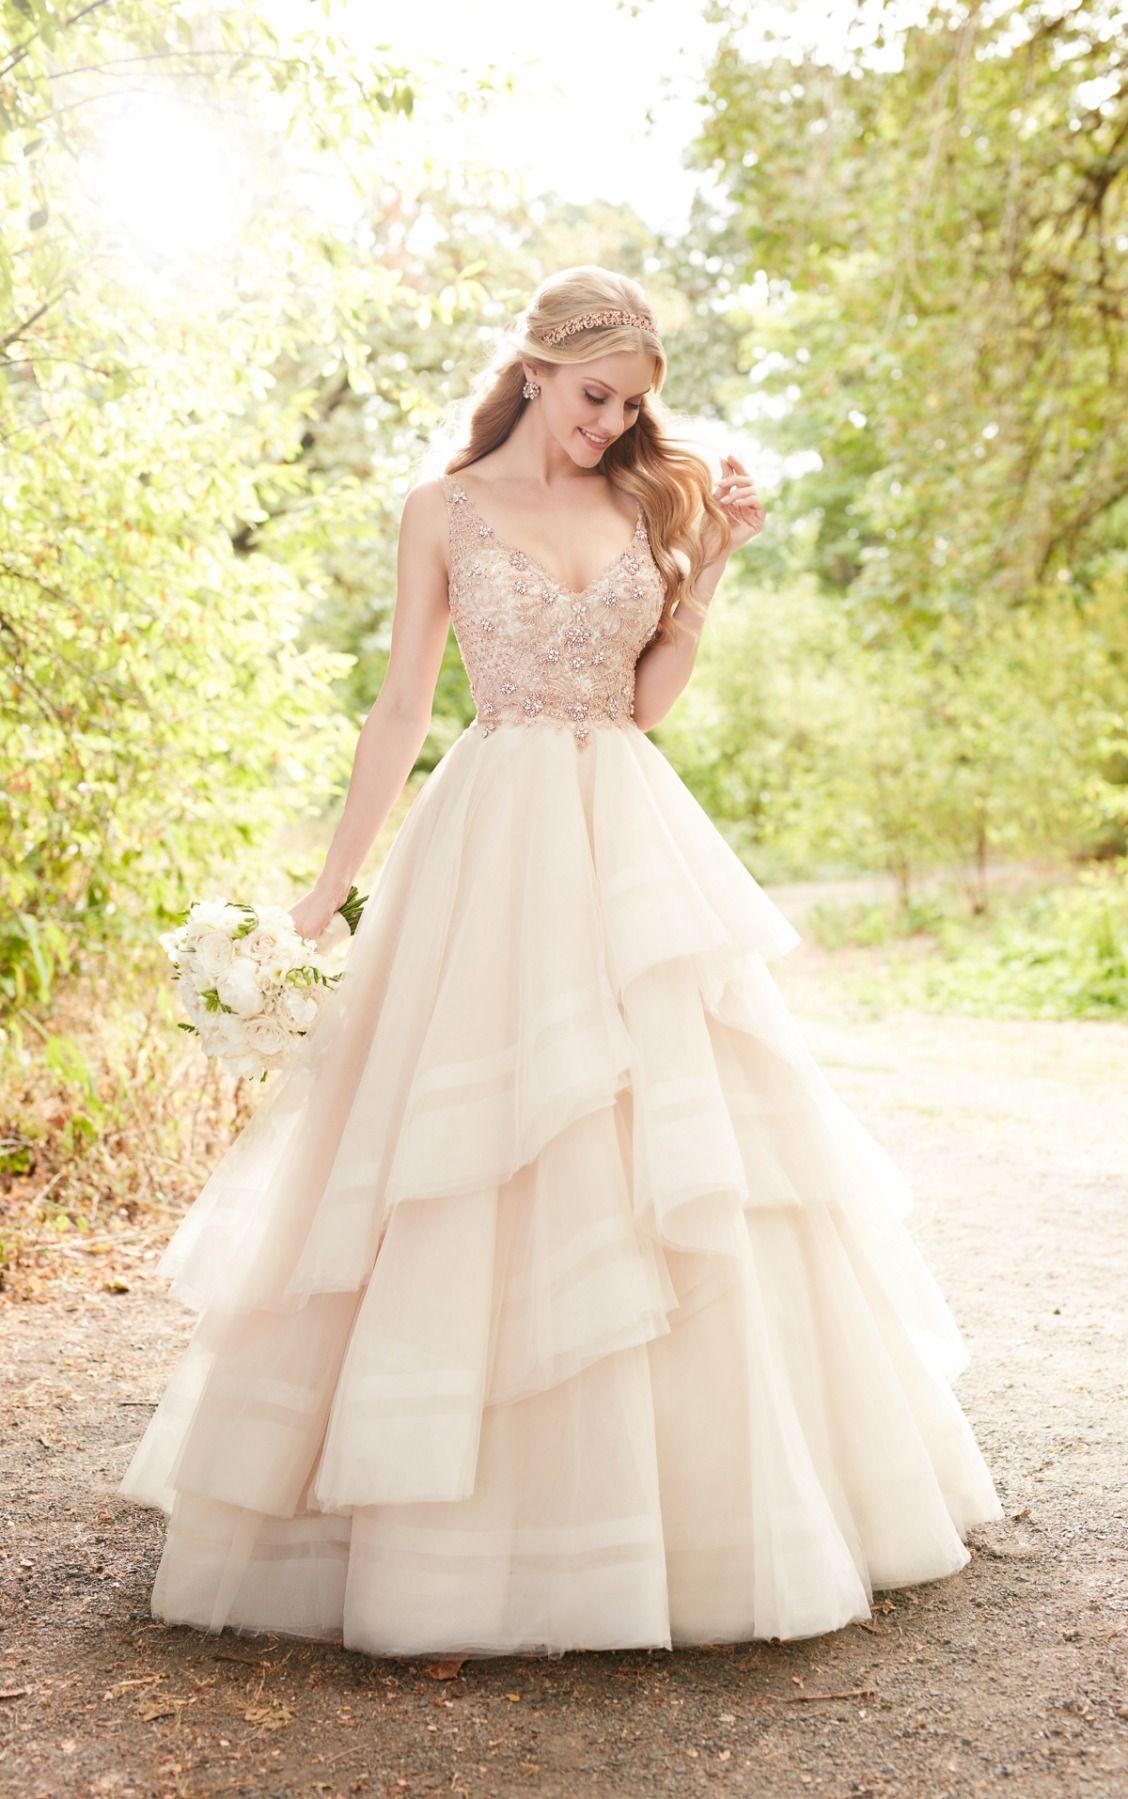 Pink Wedding Dress With Rose Gold Beading Martina Liana Ball Gowns Wedding Colored Wedding Dresses Wedding Dresses